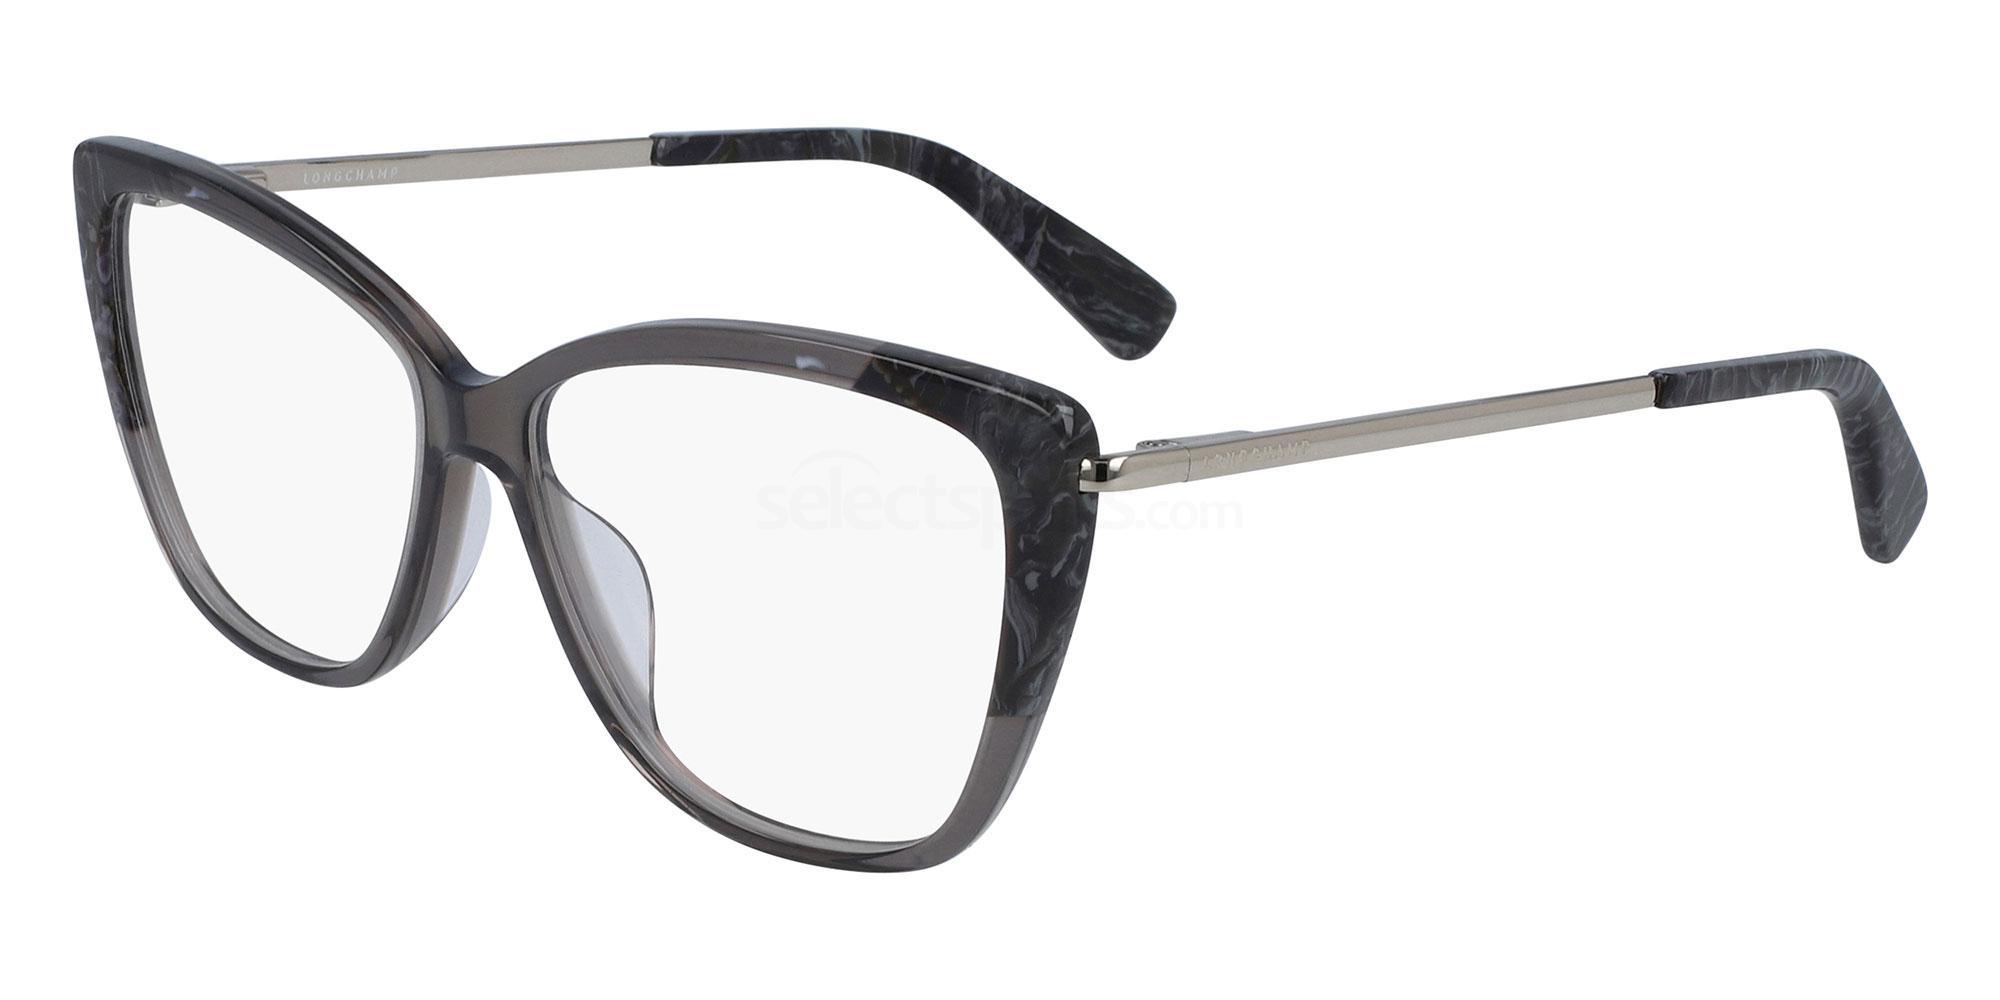 036 LO2640 Glasses, LONGCHAMP